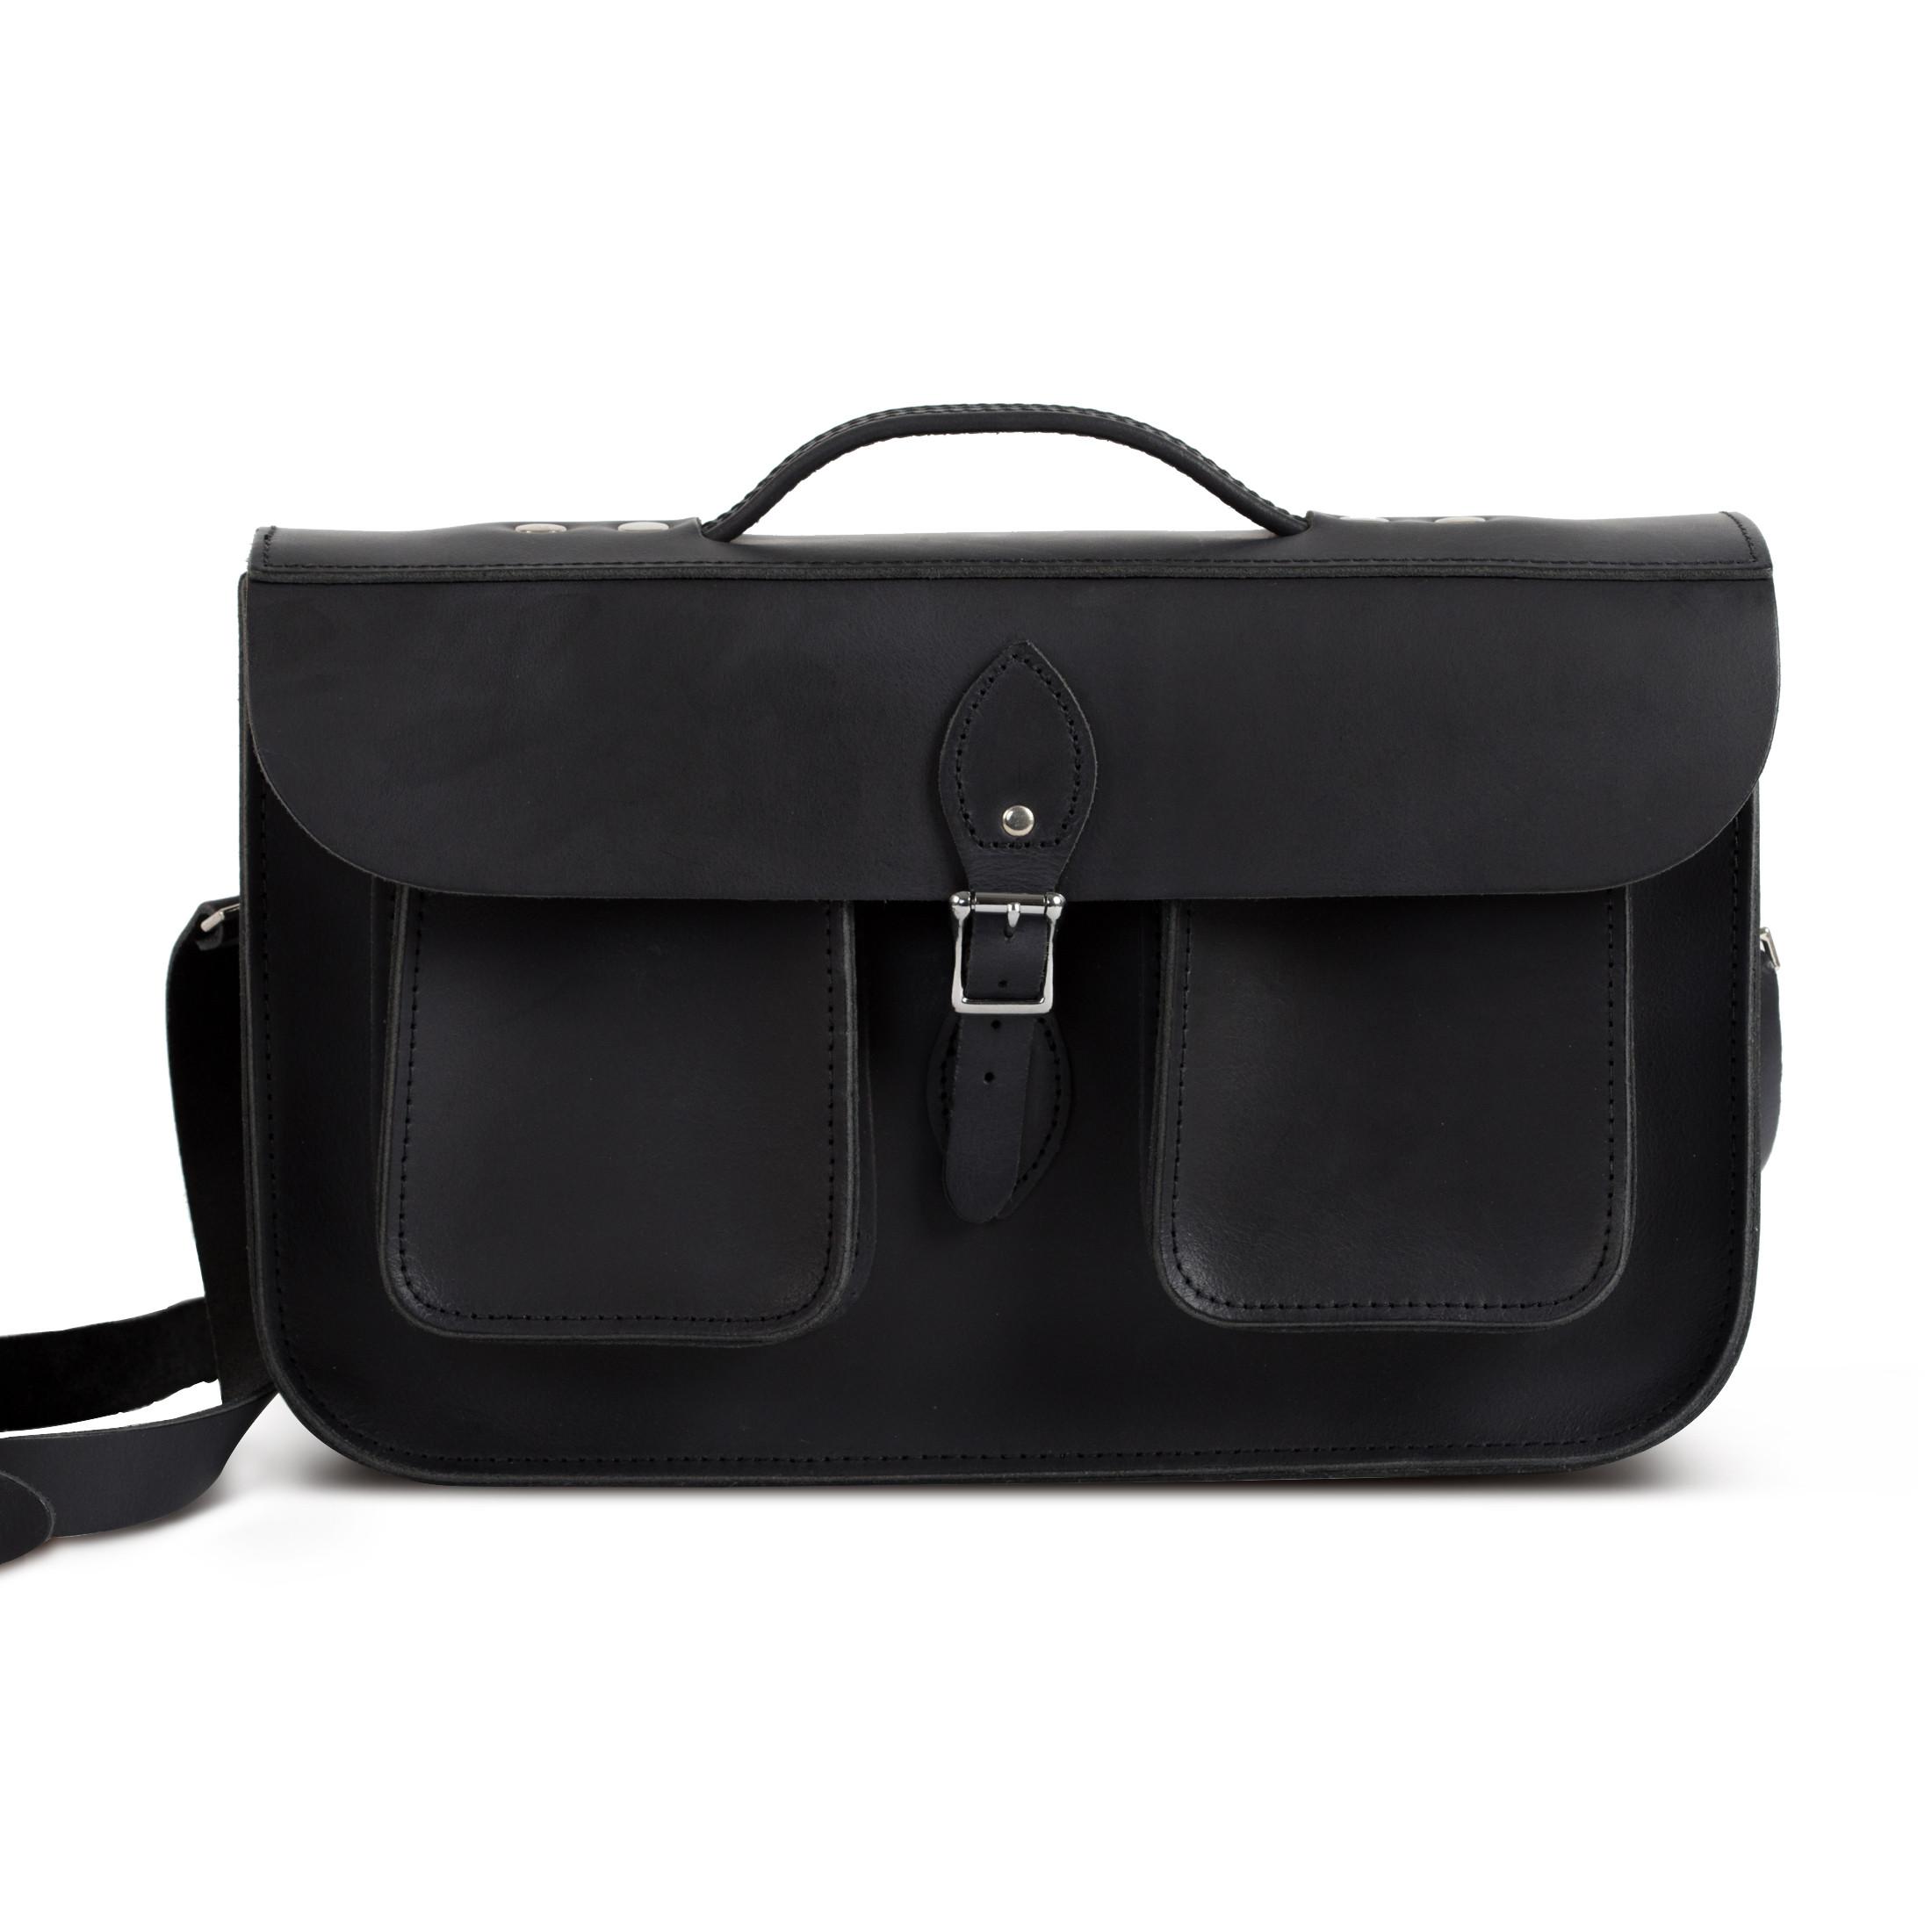 Jude Premium Leather Briefcase in Vintage Black